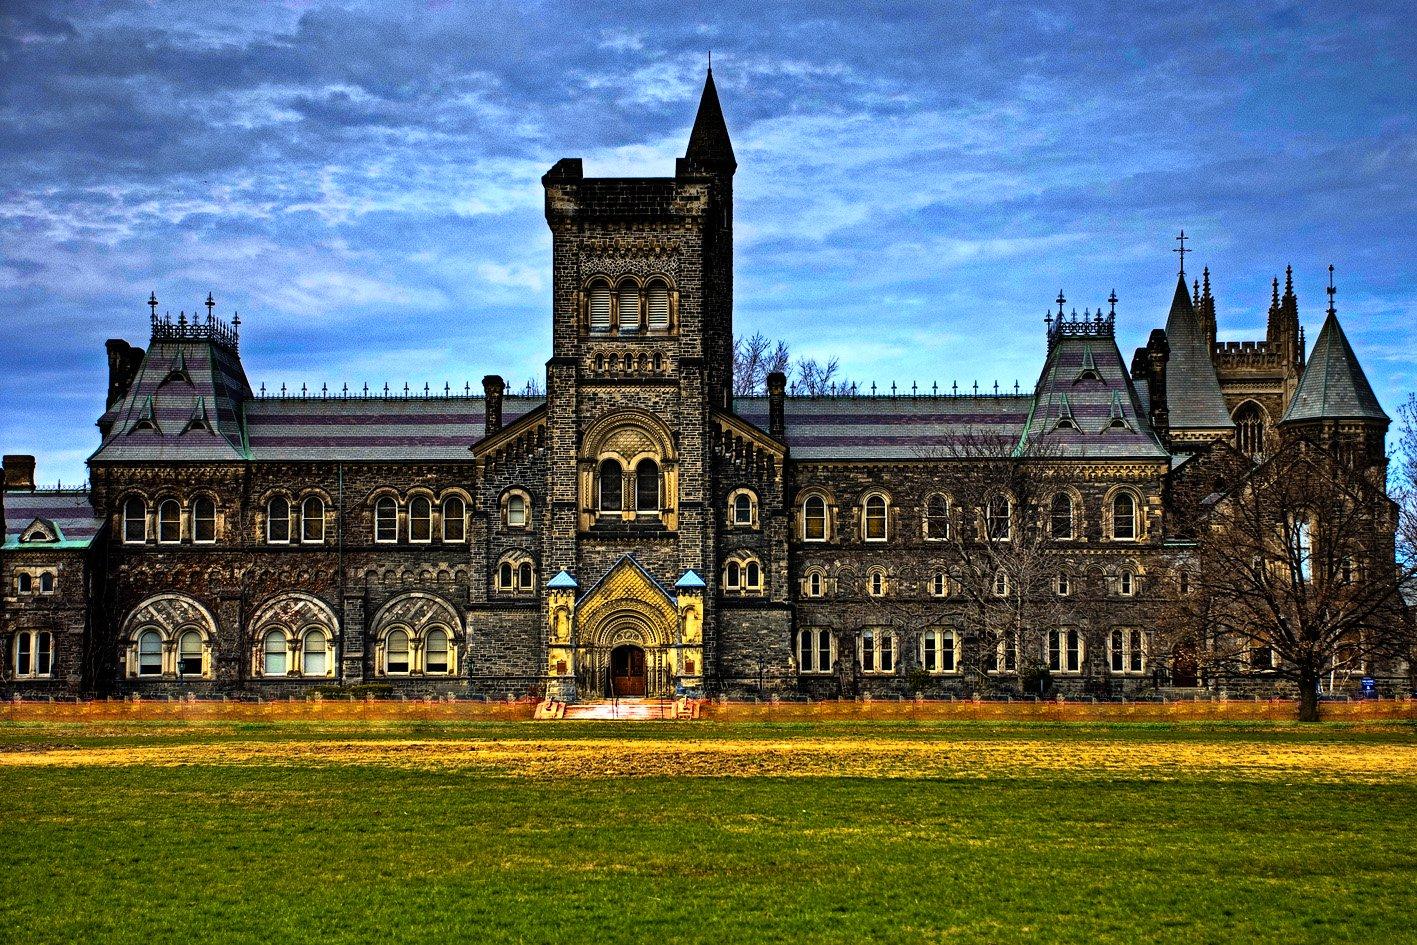 University college toronto 1   april 2009 hdr 1